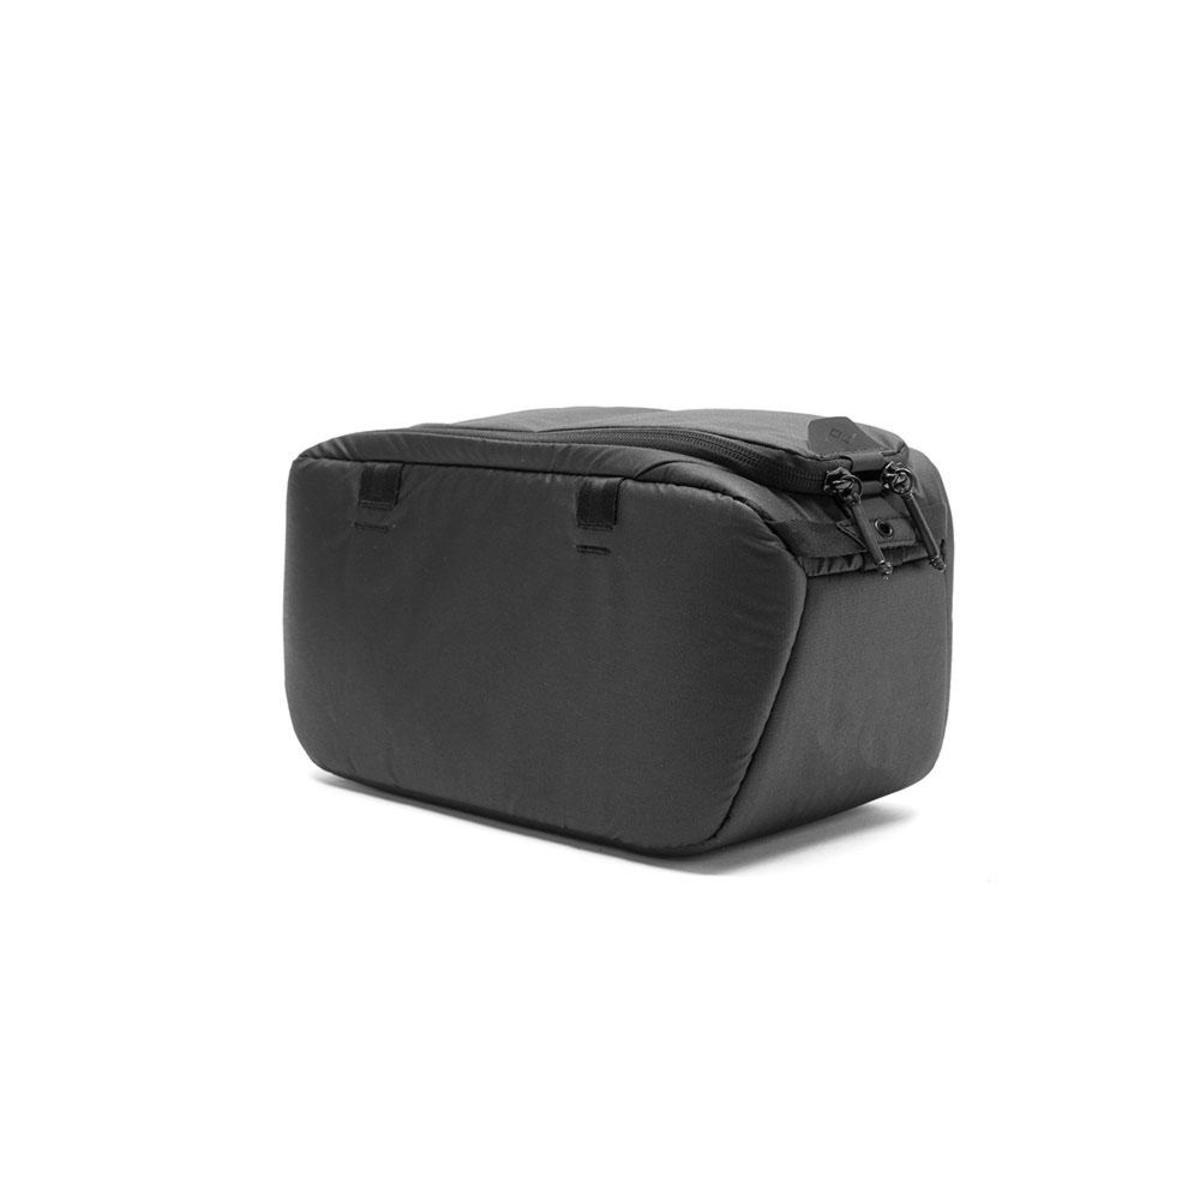 CAMERA CUBE Bag BackPack MultiFunction DSRL Bag SMALL